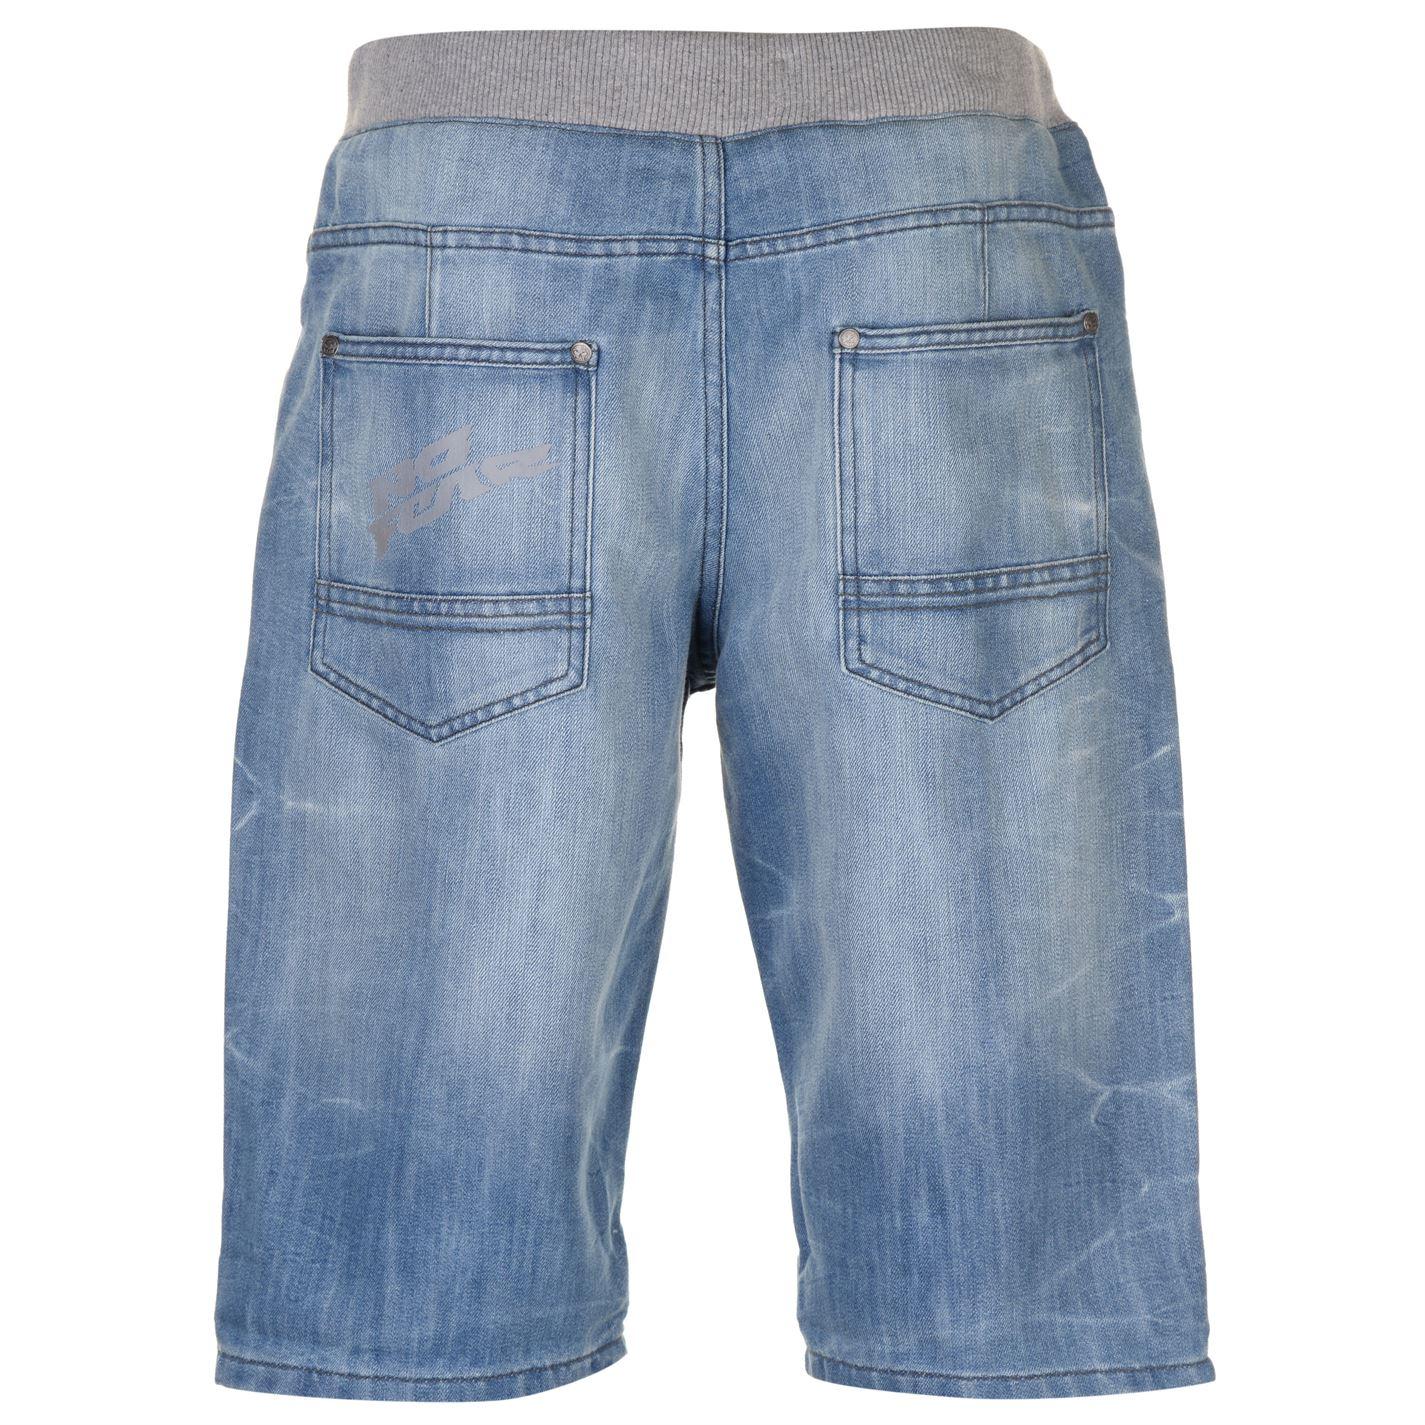 No-Fear-Mens-Denim-Shorts-Pants-Trousers-Bottoms-Zip-Warm-Drawstring-Elasticated thumbnail 7